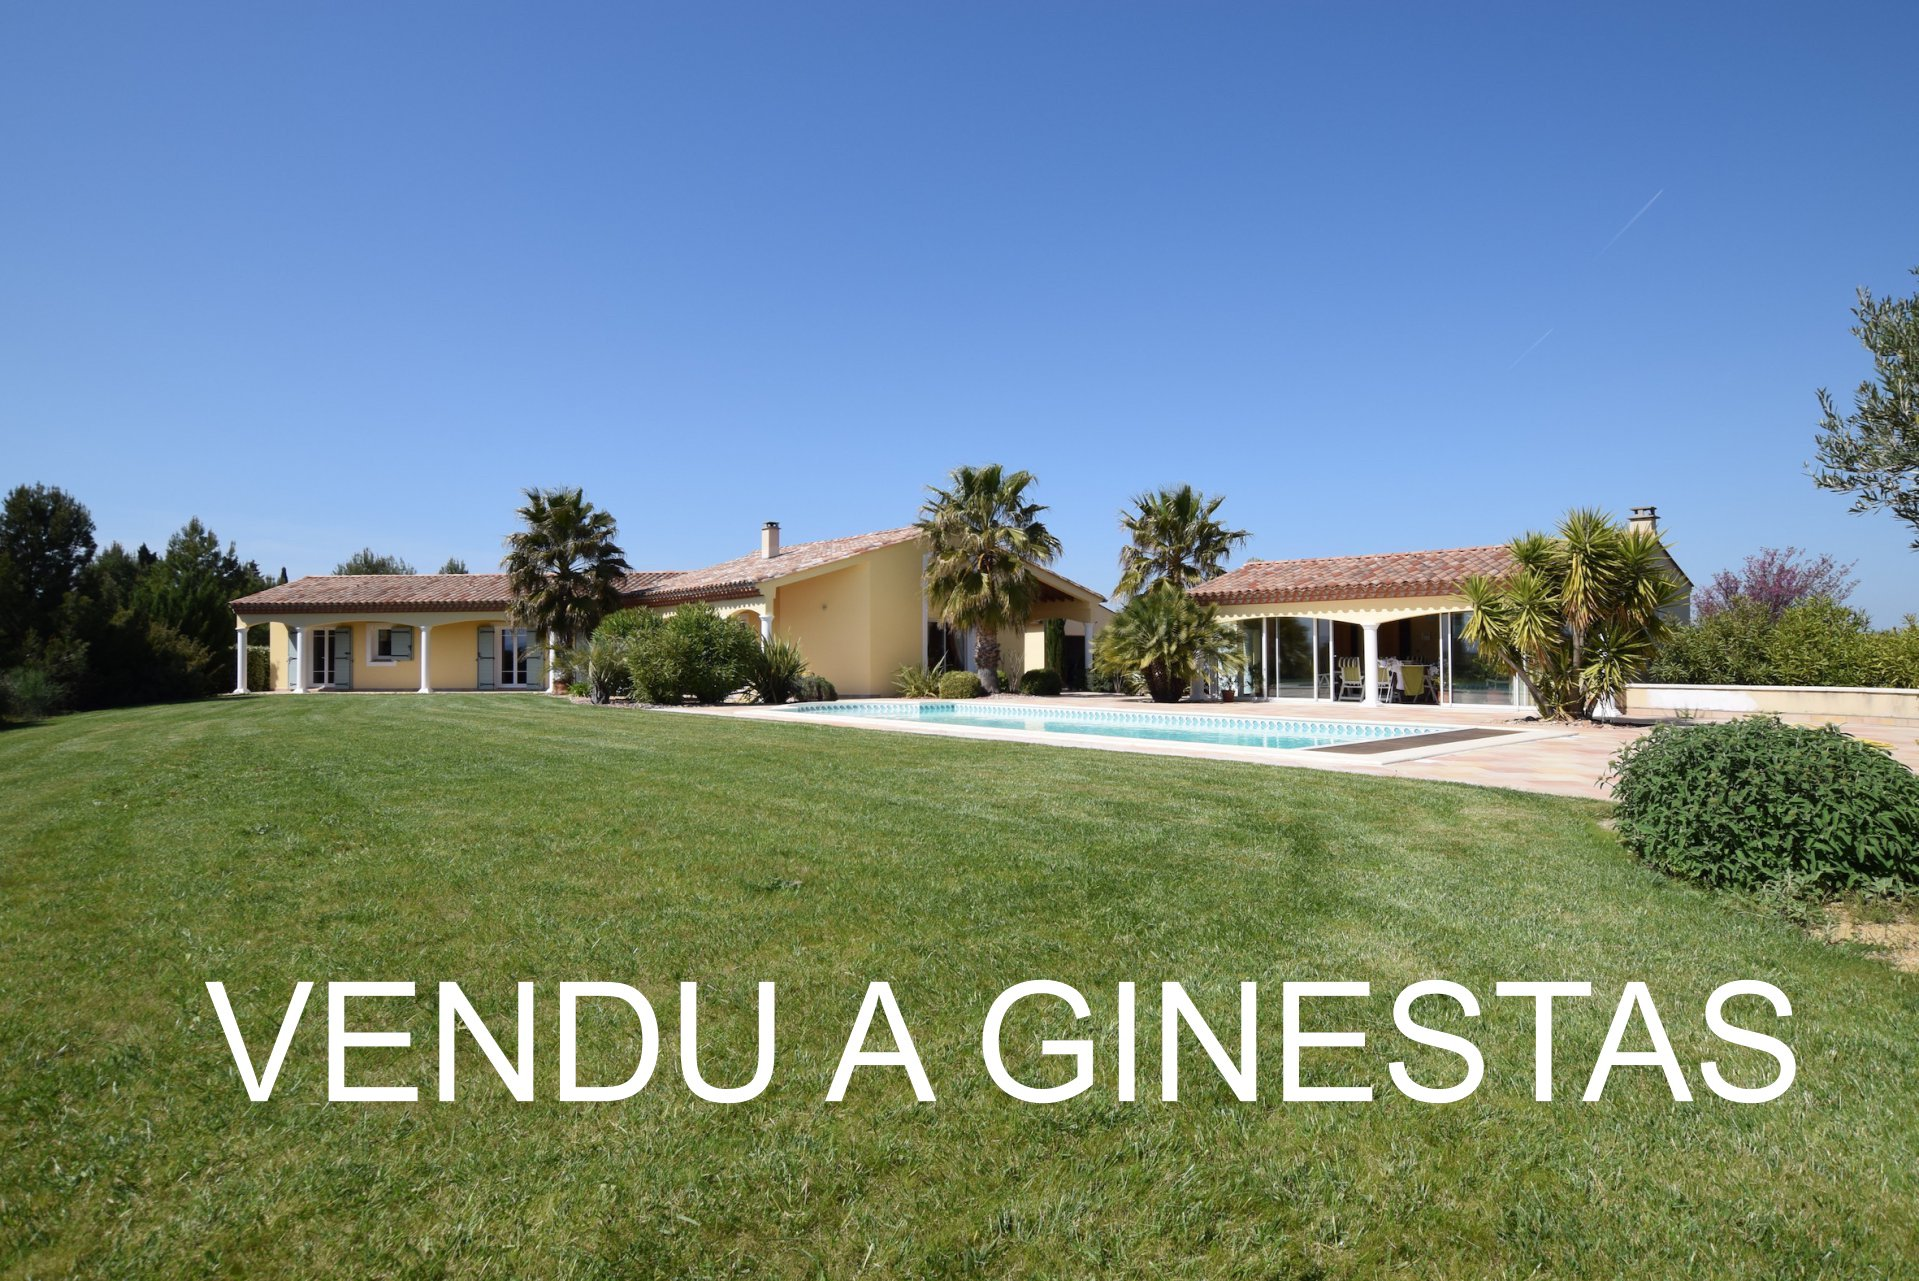 Vente Maison de village - Ginestas